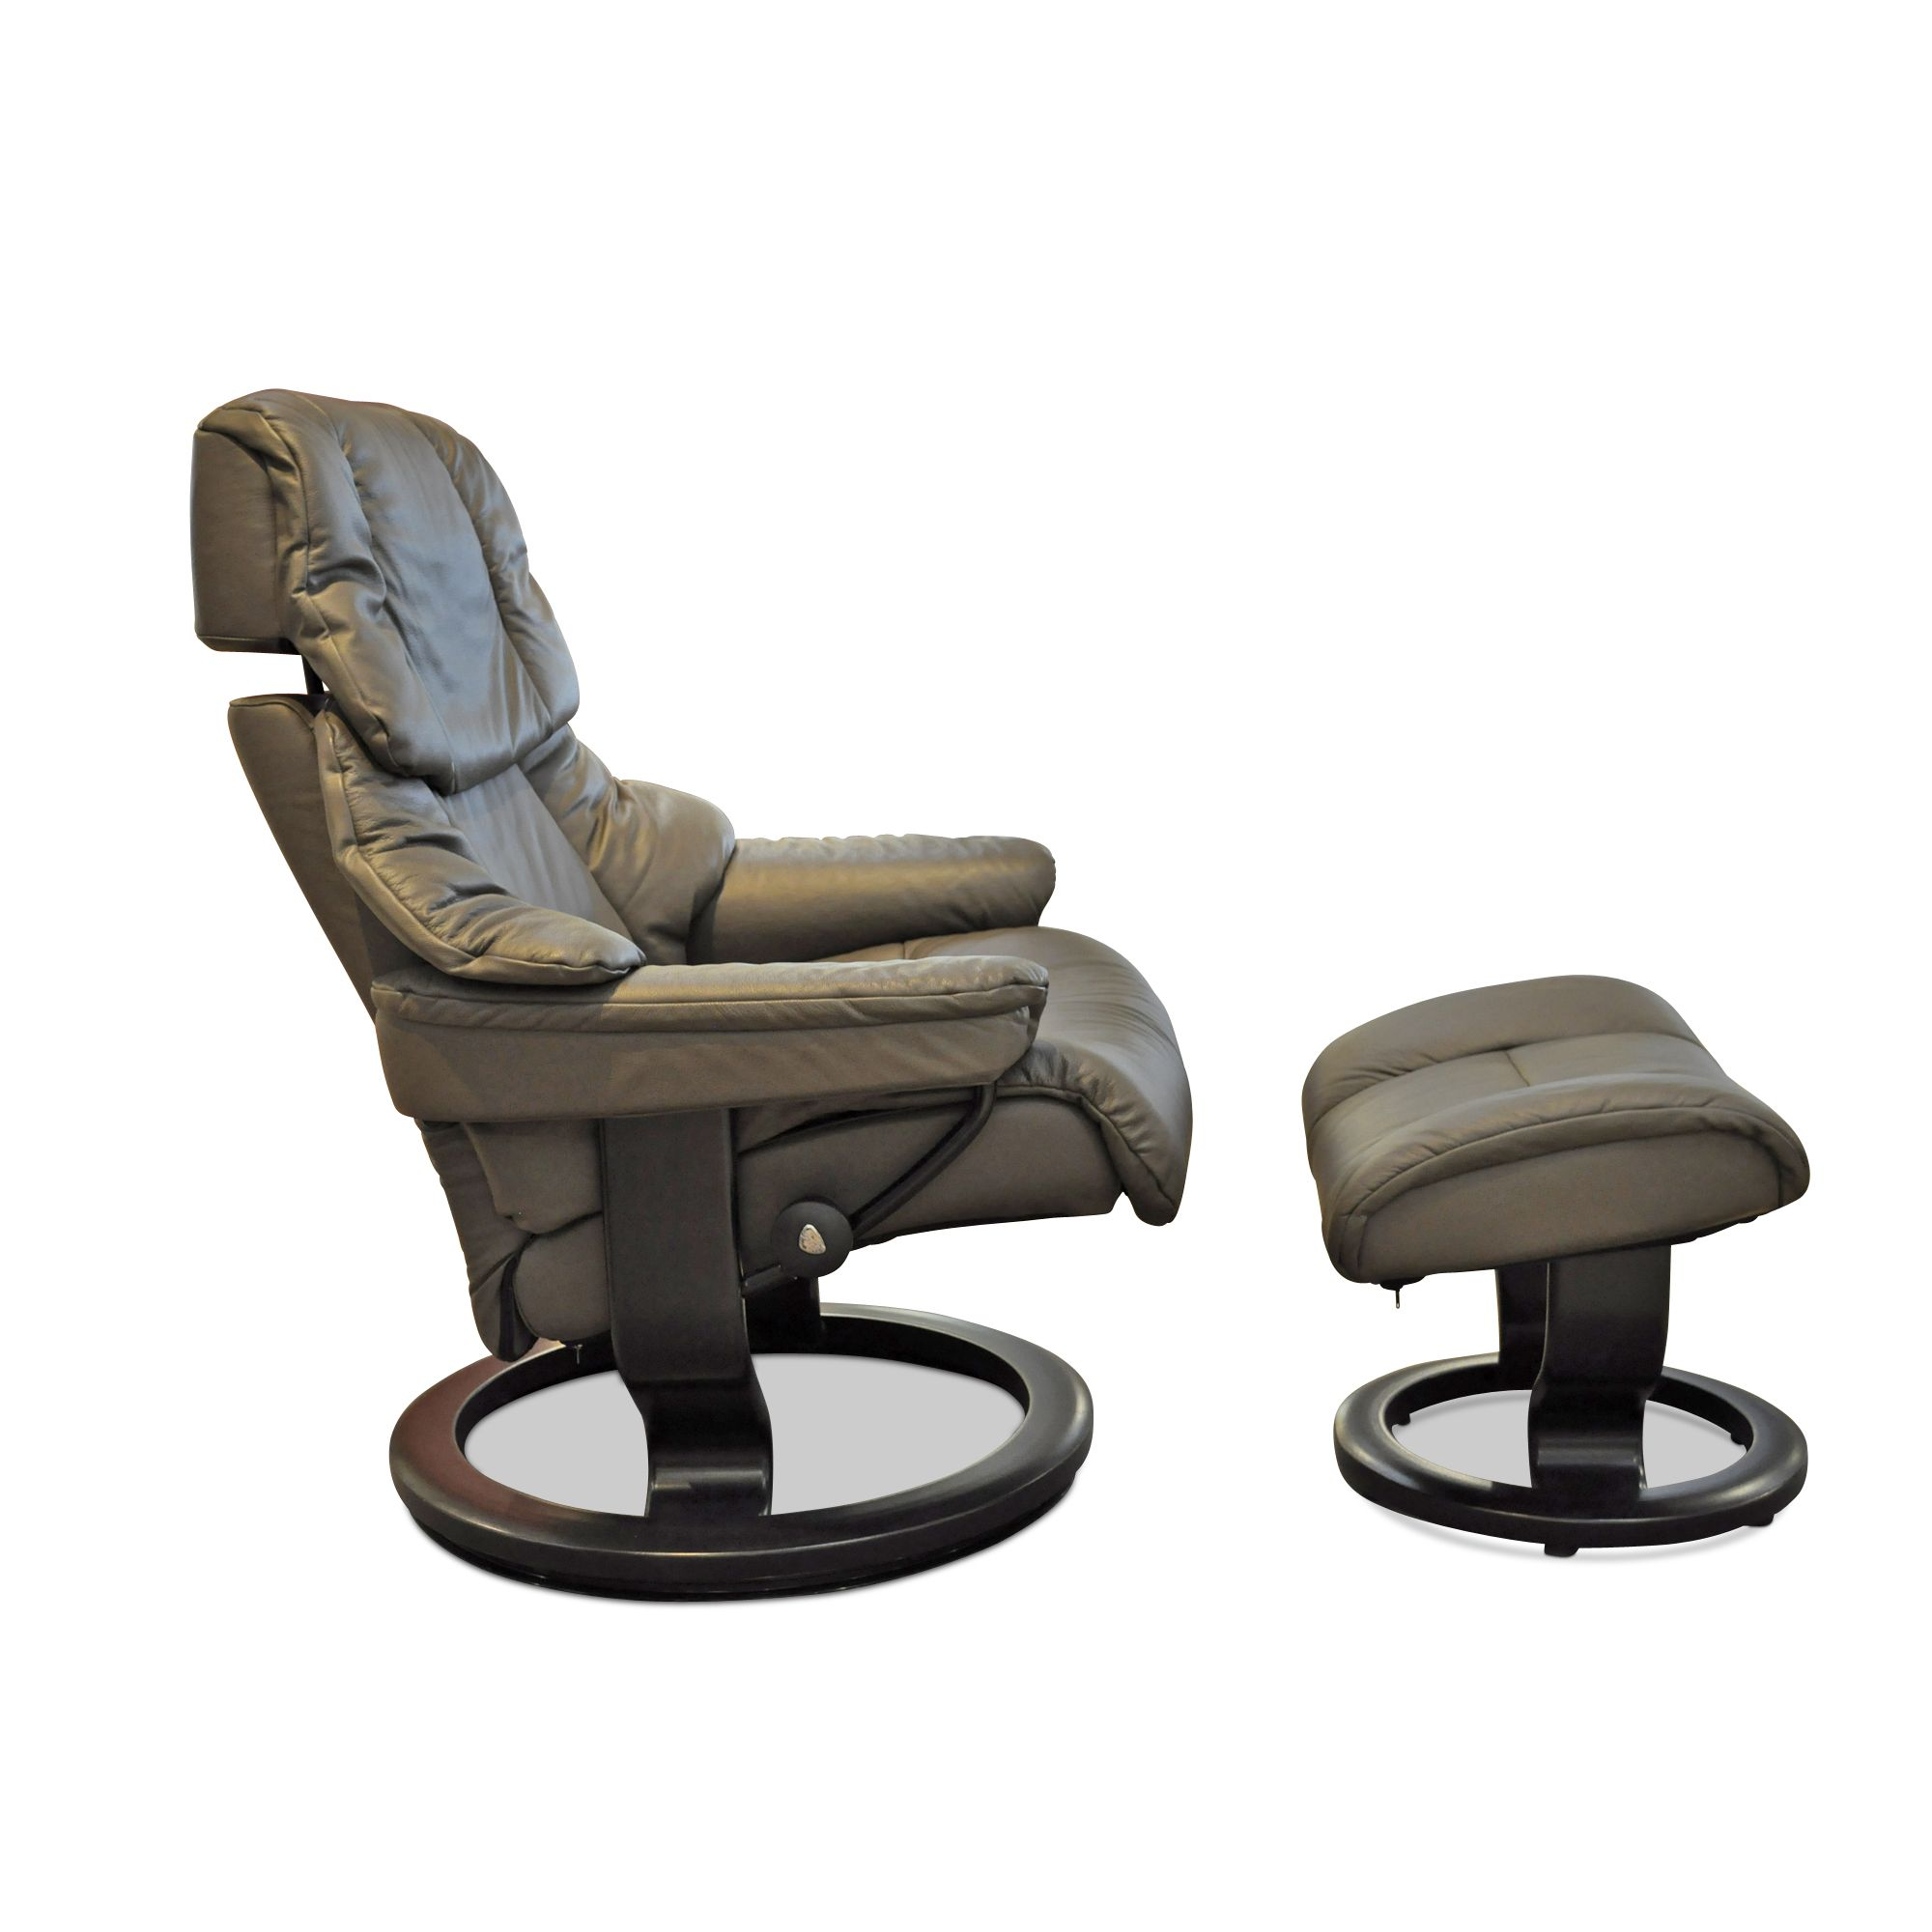 Sessel Reno L Mit Hocker Stressless Sessel Günstig Kaufen